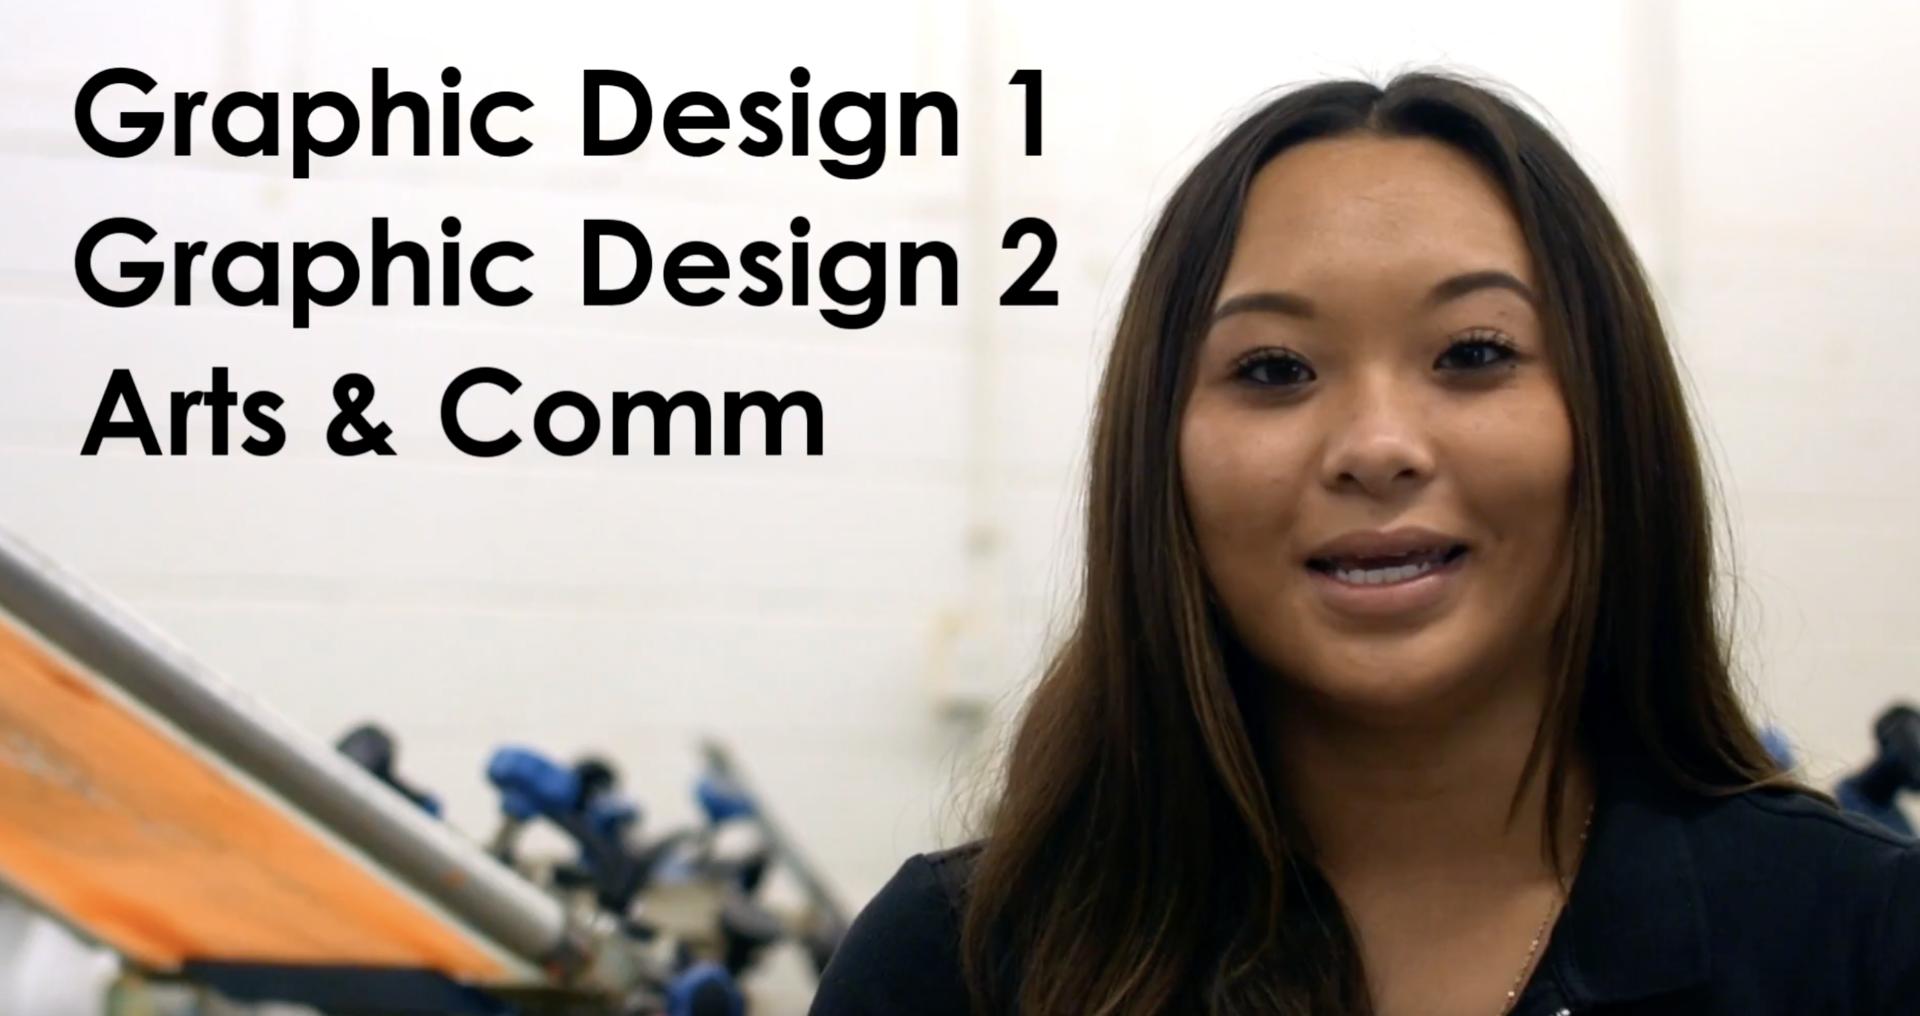 Graphic Design Video